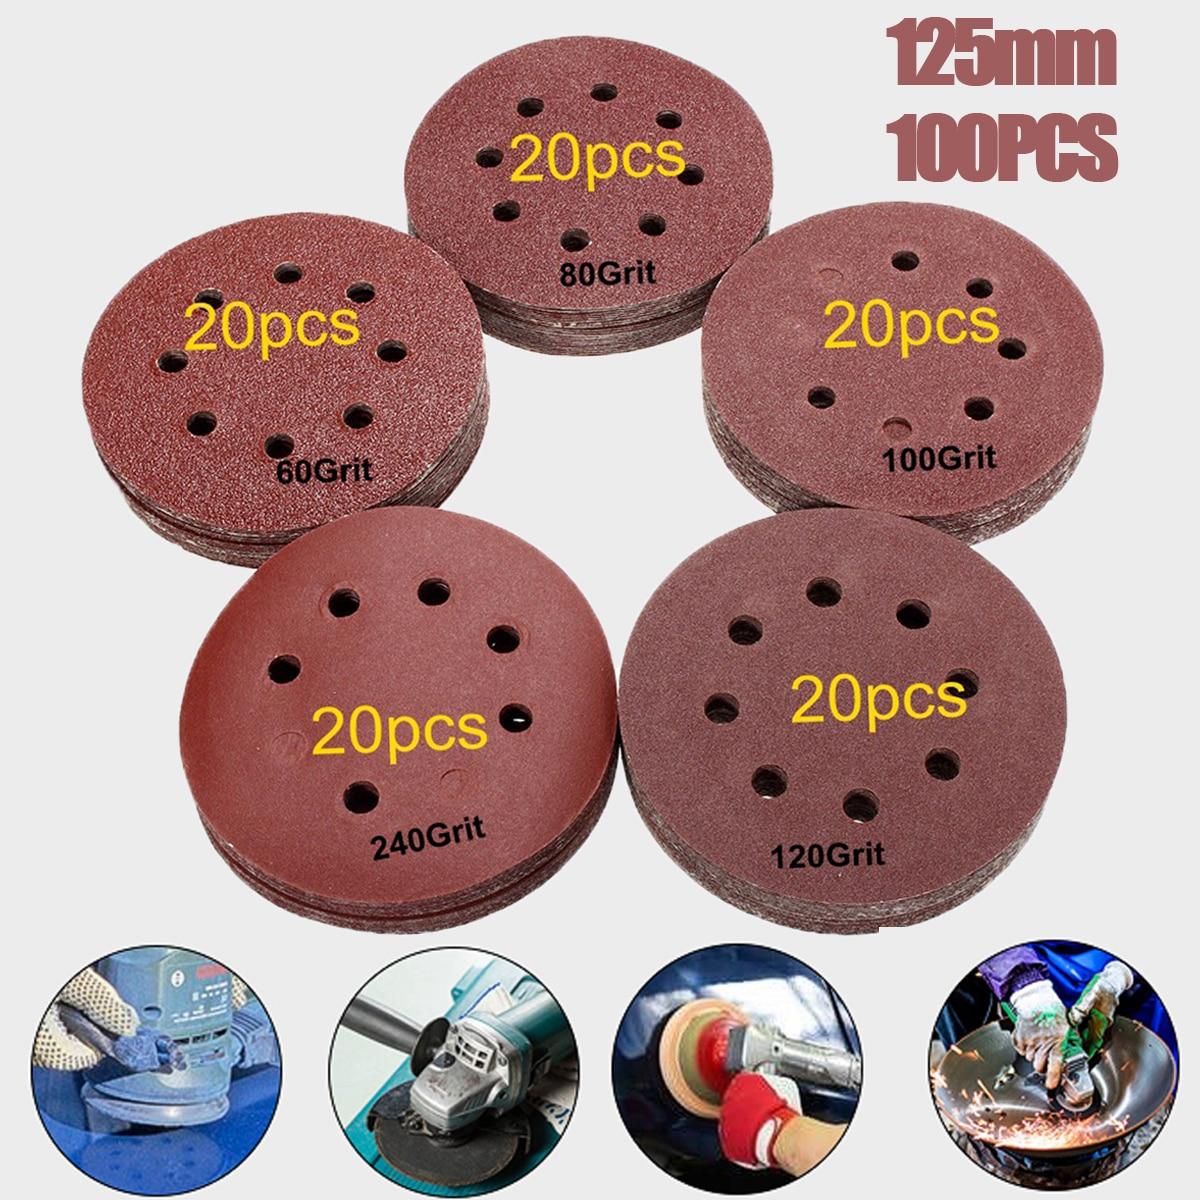 100pcs 125mm 60 80 100 120 240 Grit Round Shape Sanding Discs 8 Hole Sander Sandpaper Polishing Pad Buffing Sheet Each of 20